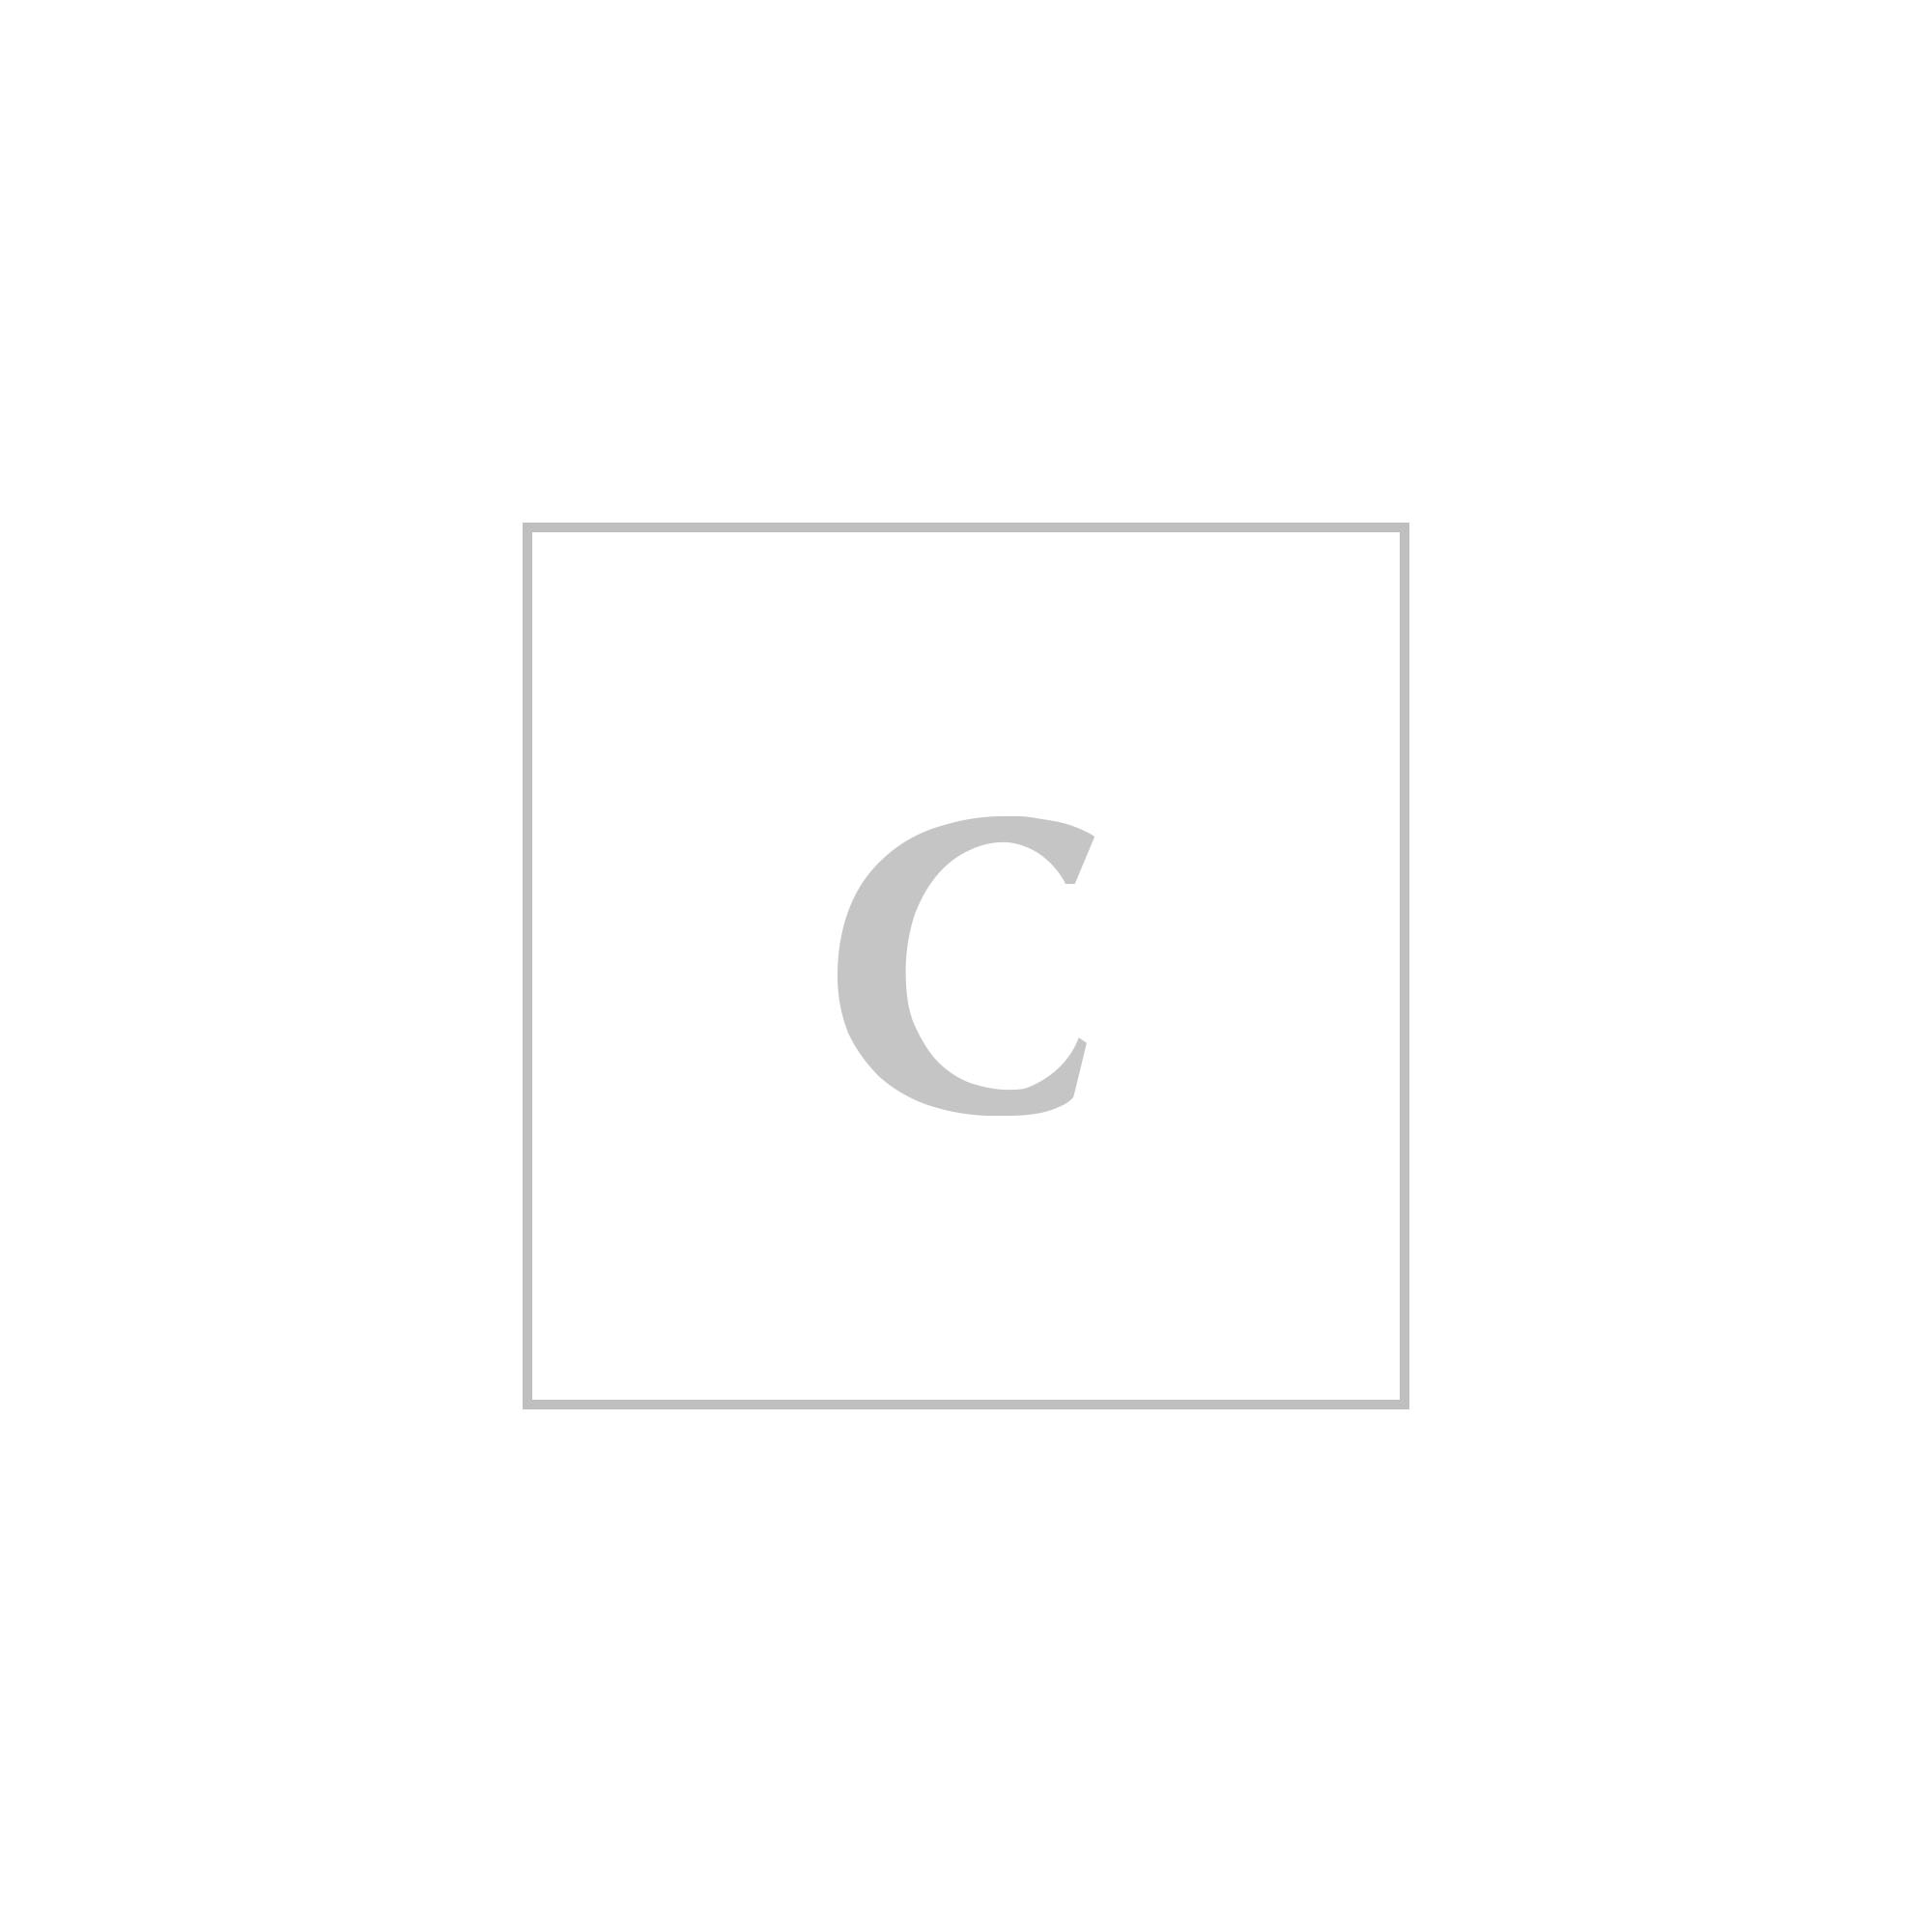 Prada portafoglio saffiano bicolor